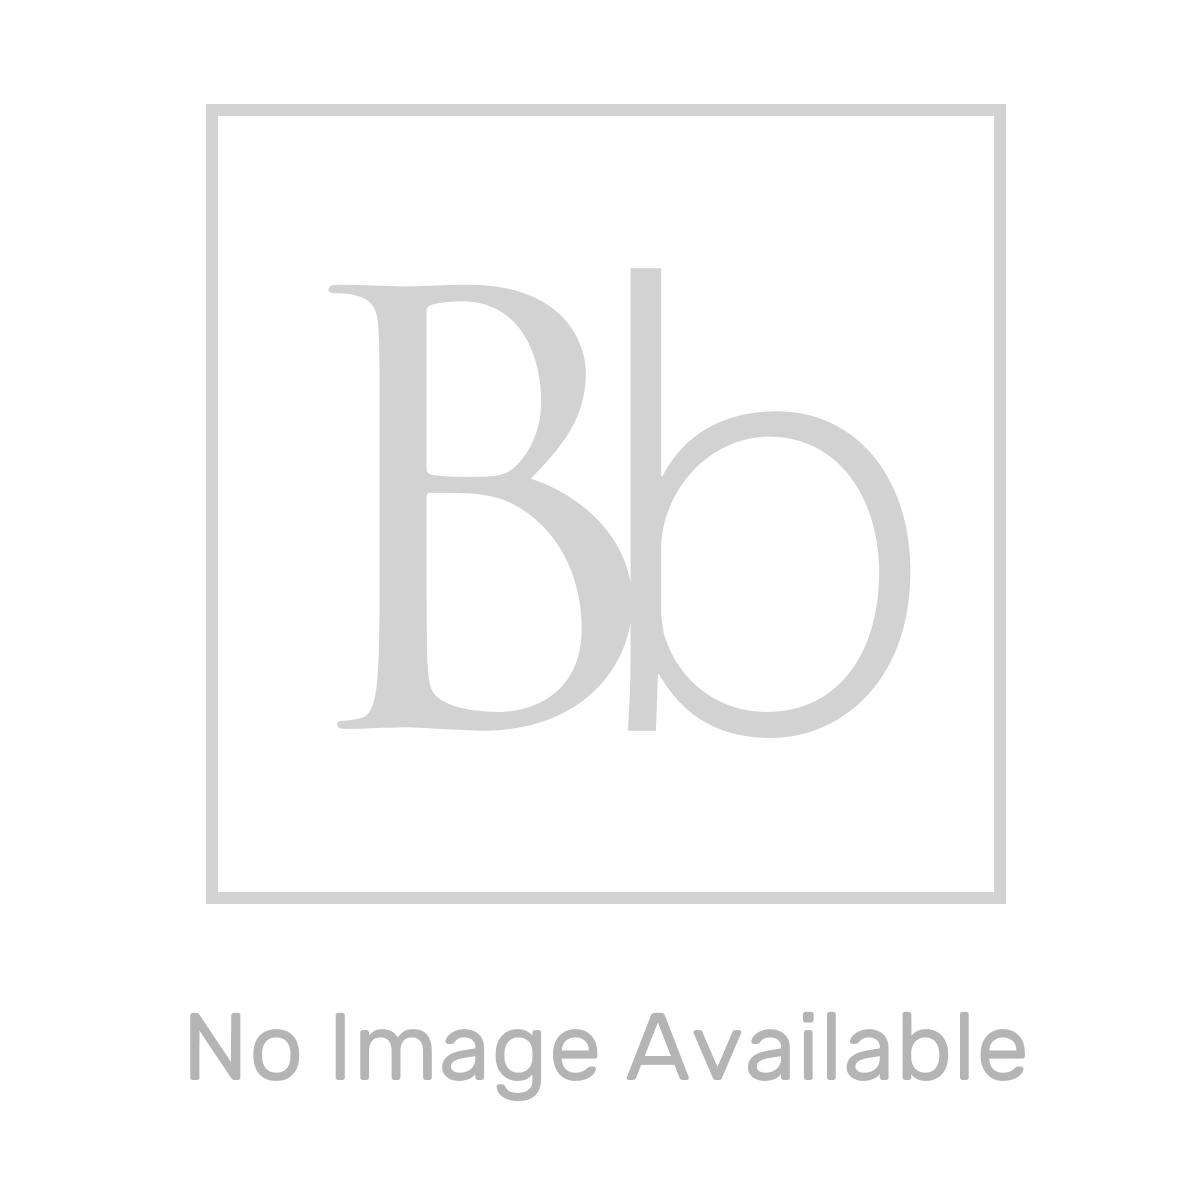 HiB Hush Matt Silver Wall Mounted Wetroom Extractor Fan with Humidity Sensor